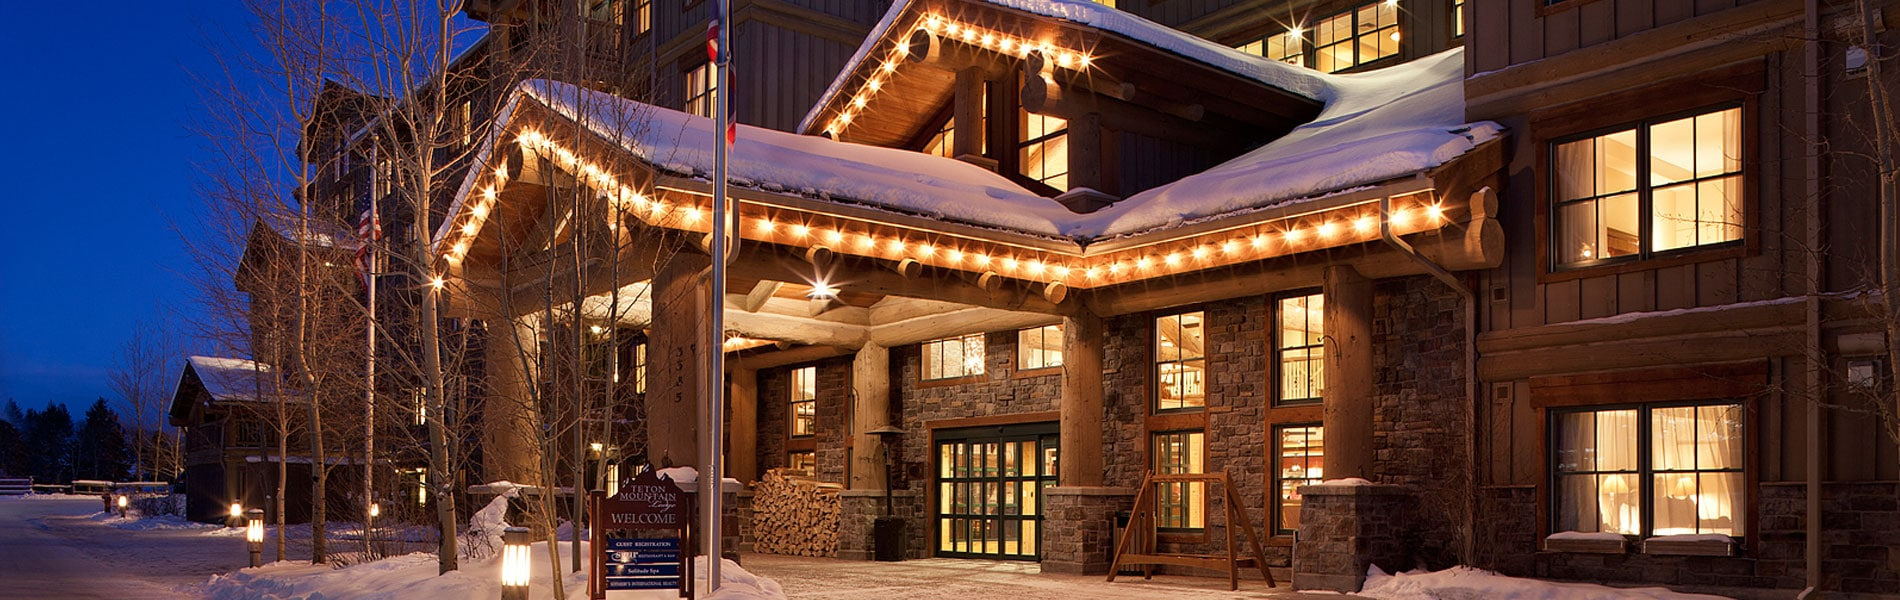 Teton Mountain Lodge exterior with Christmas lights